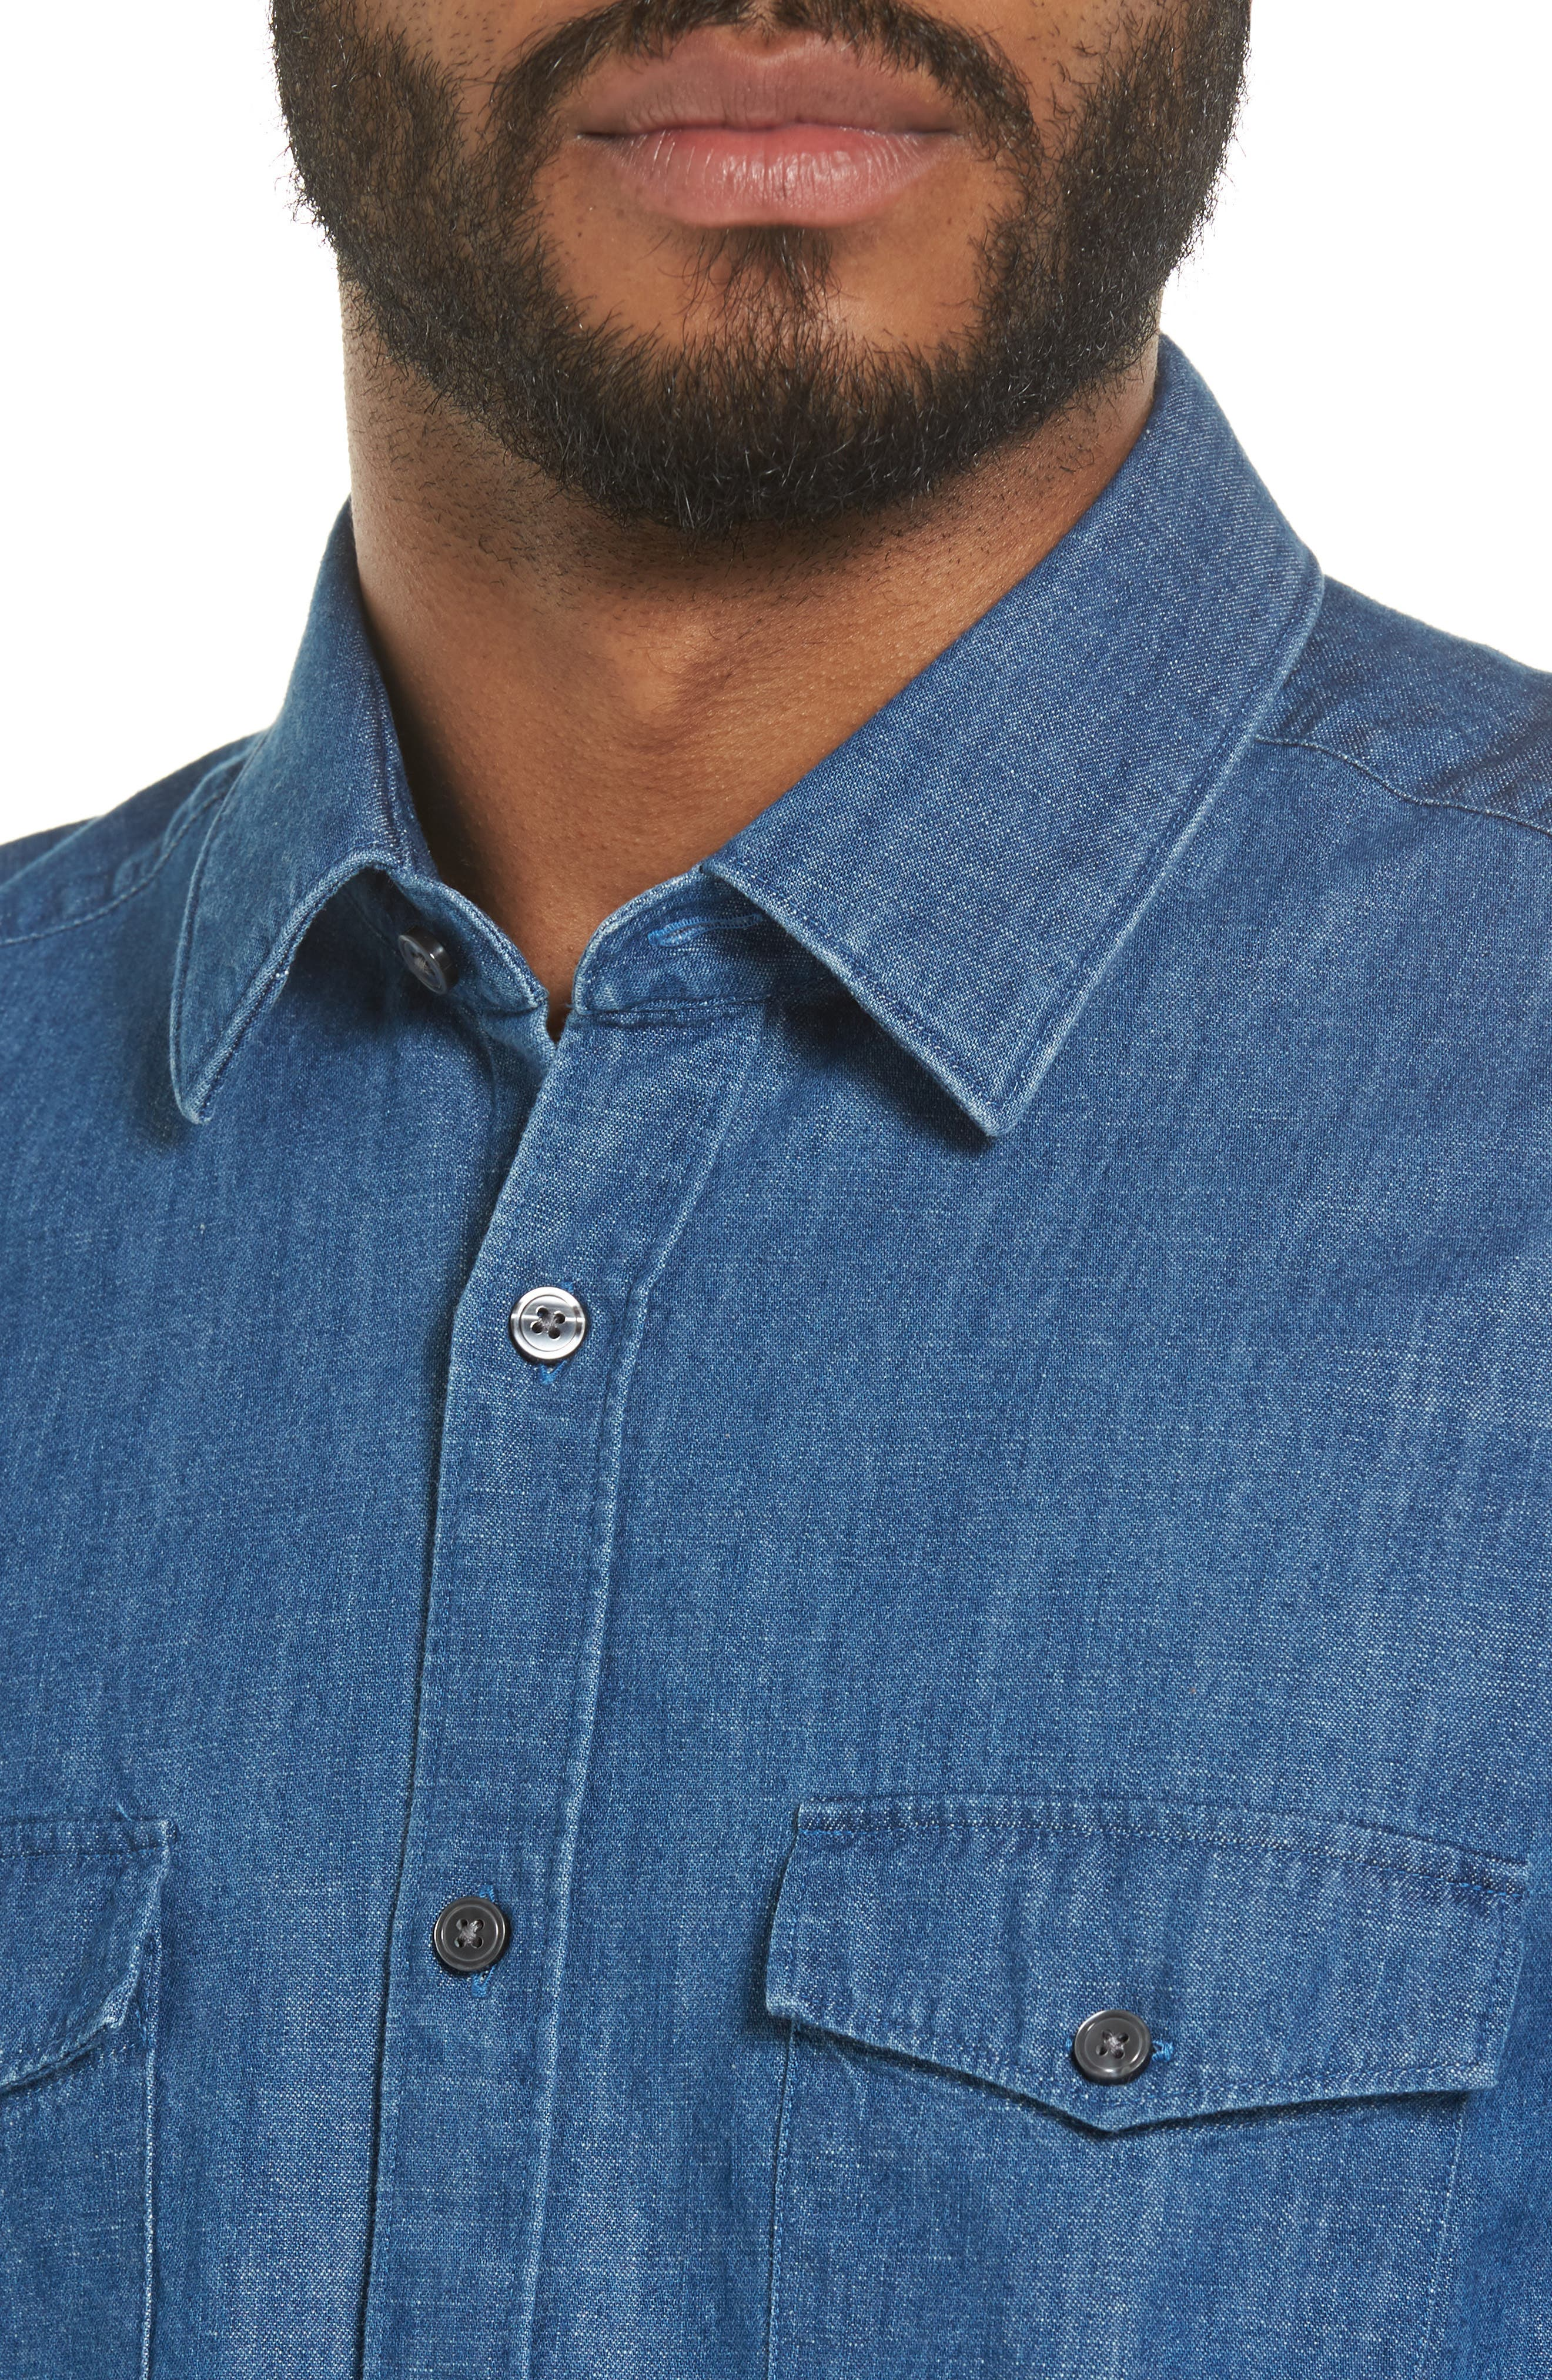 Lance Regular Fit Two-Pocket Denim Sport Shirt,                             Alternate thumbnail 4, color,                             Blue